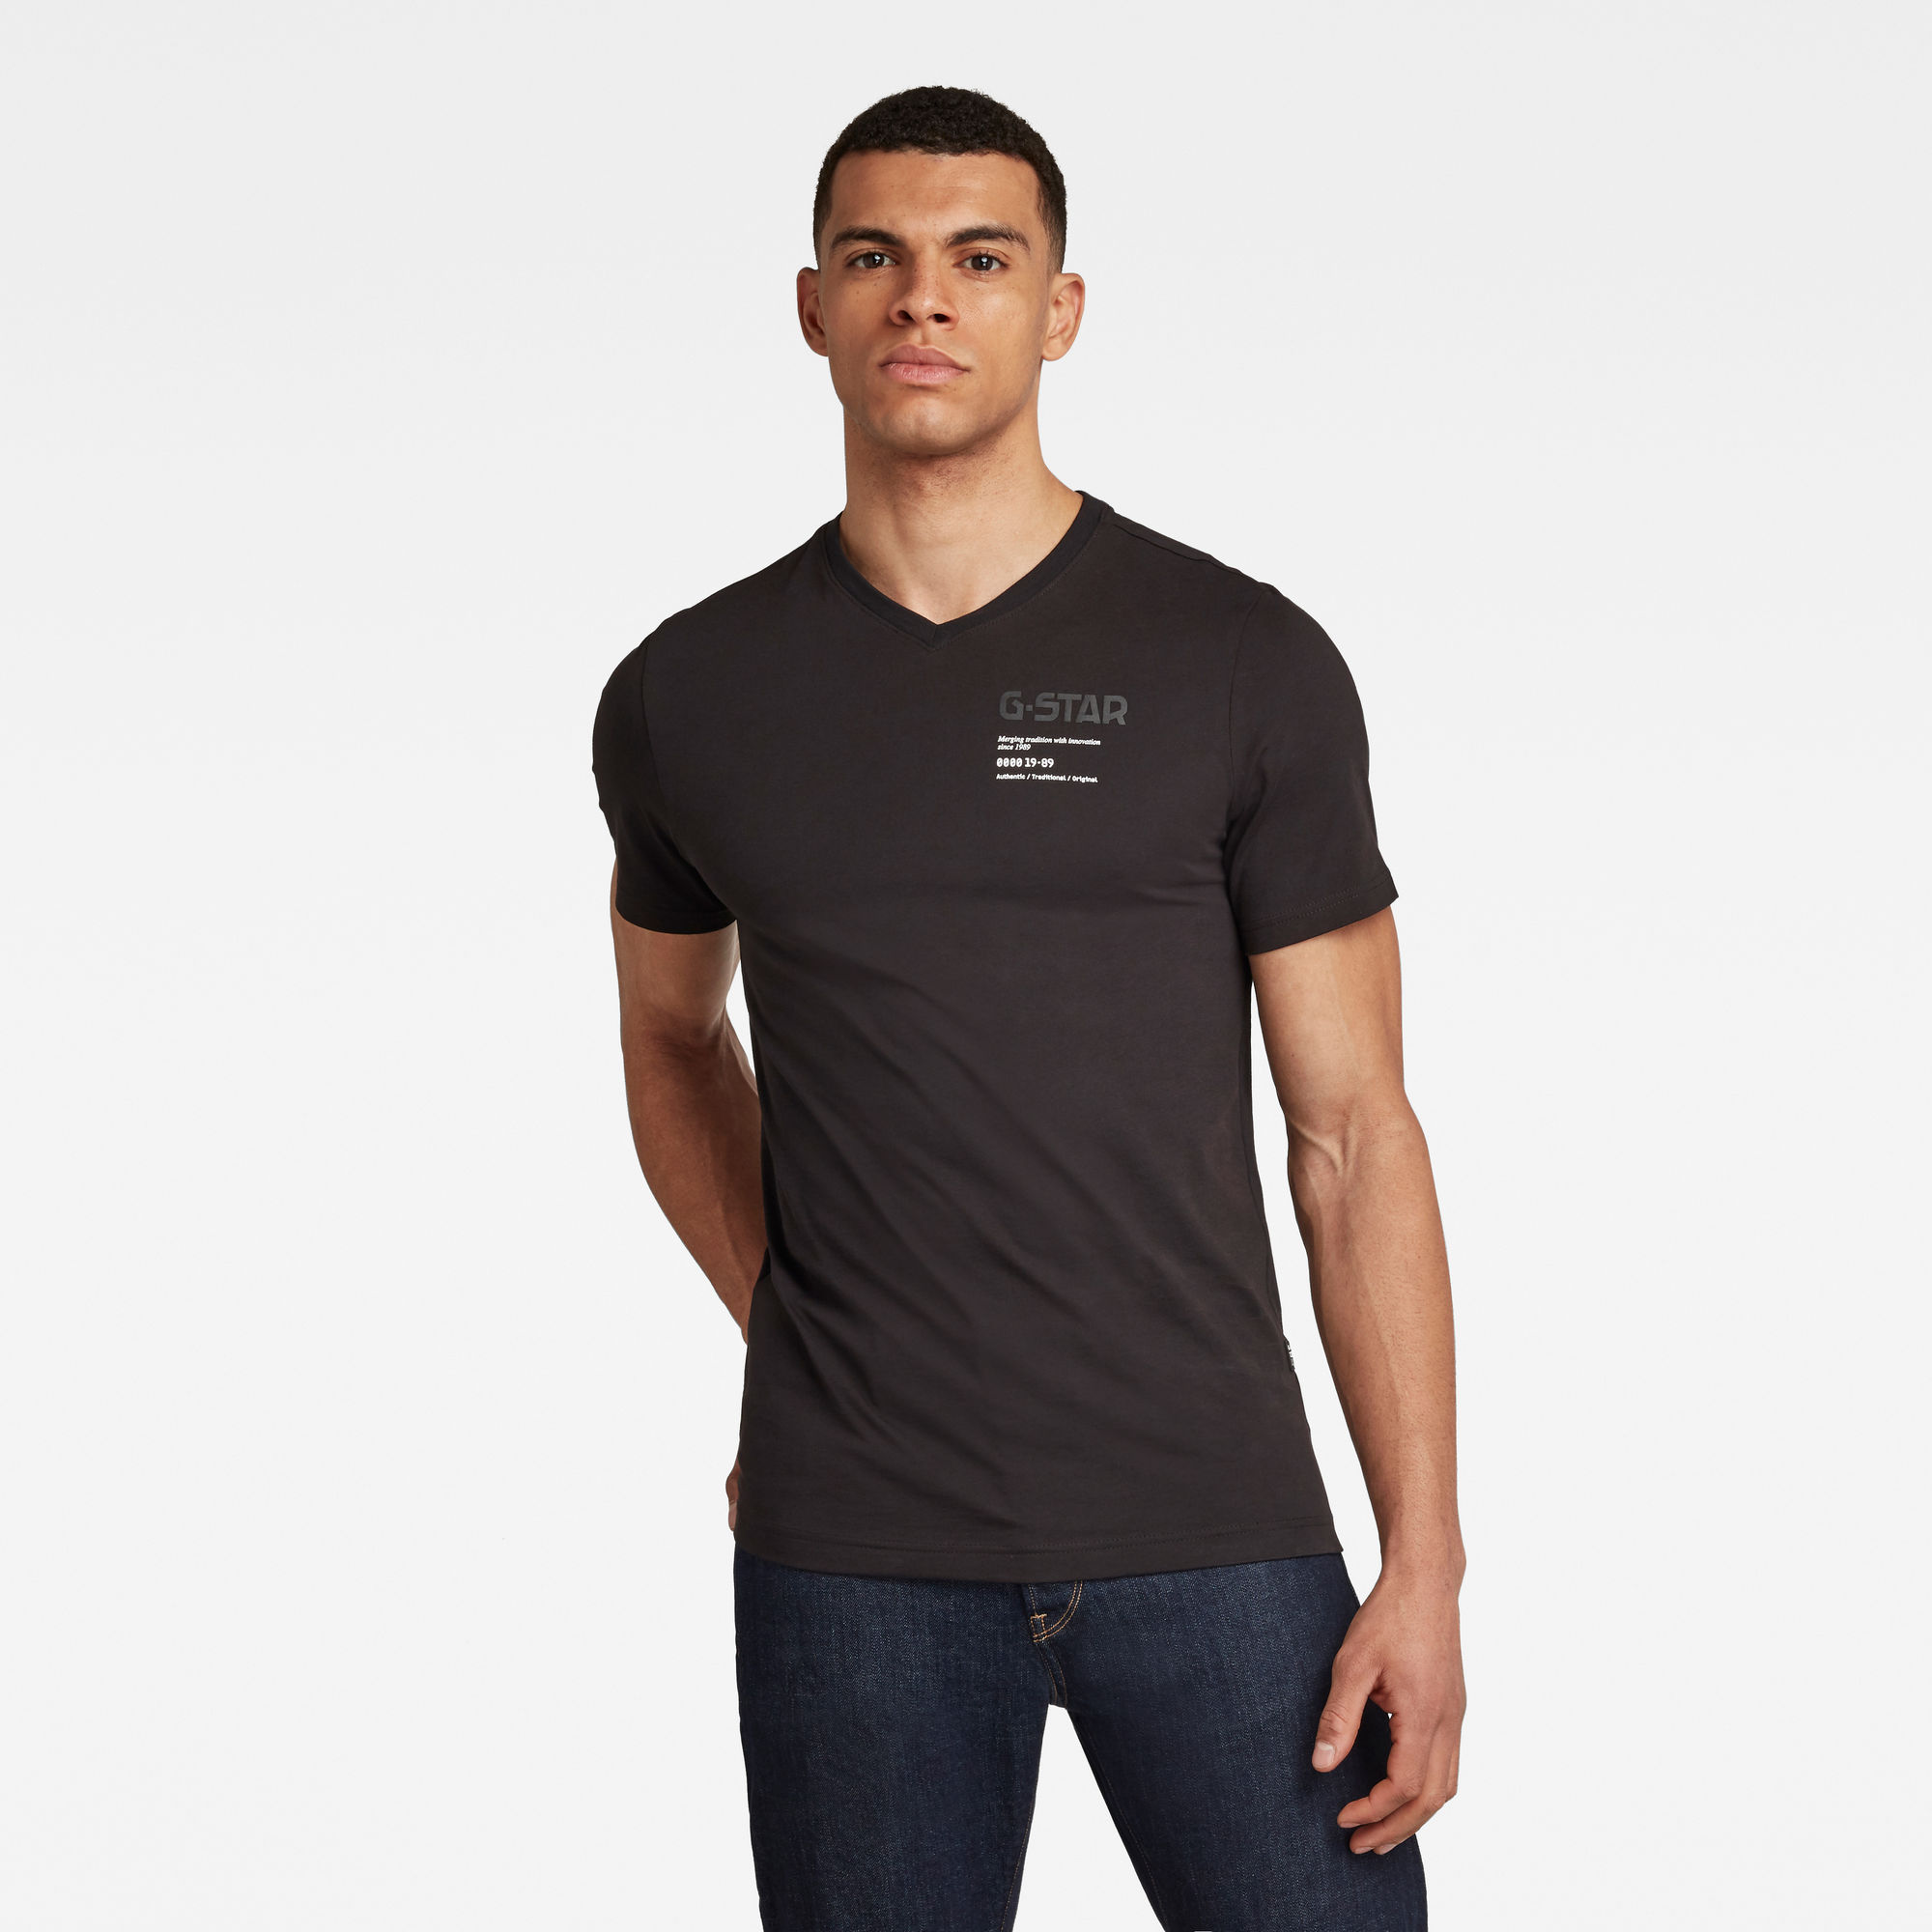 G-Star RAW Heren G-Star Chest Graphic T-Shirt Zwart